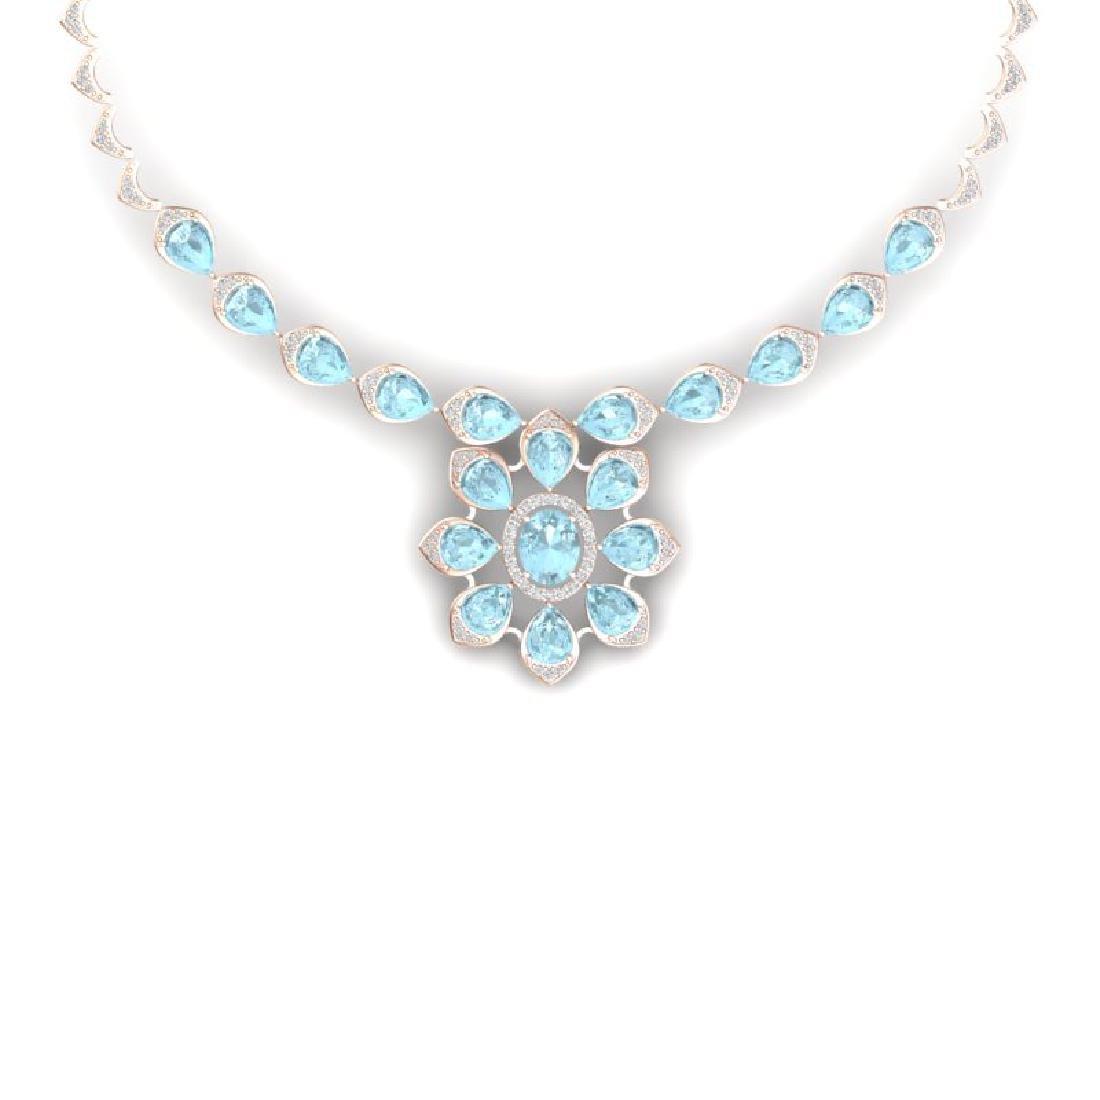 29.34 CTW Royalty Sky Topaz & VS Diamond Necklace 18K